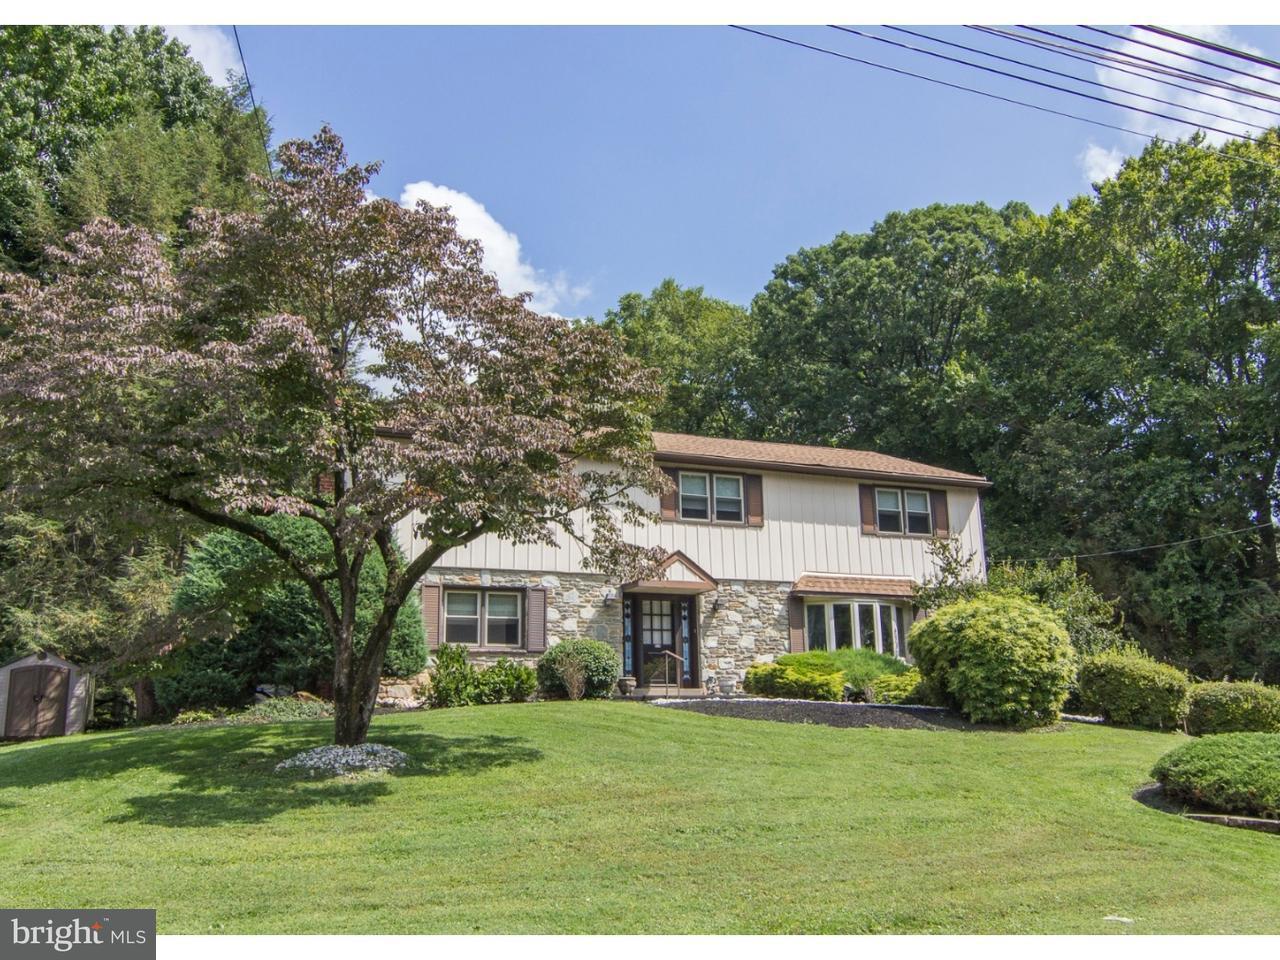 Single Family Home for Sale at 535 OAK SHADE Avenue Elkins Park, Pennsylvania 19027 United States